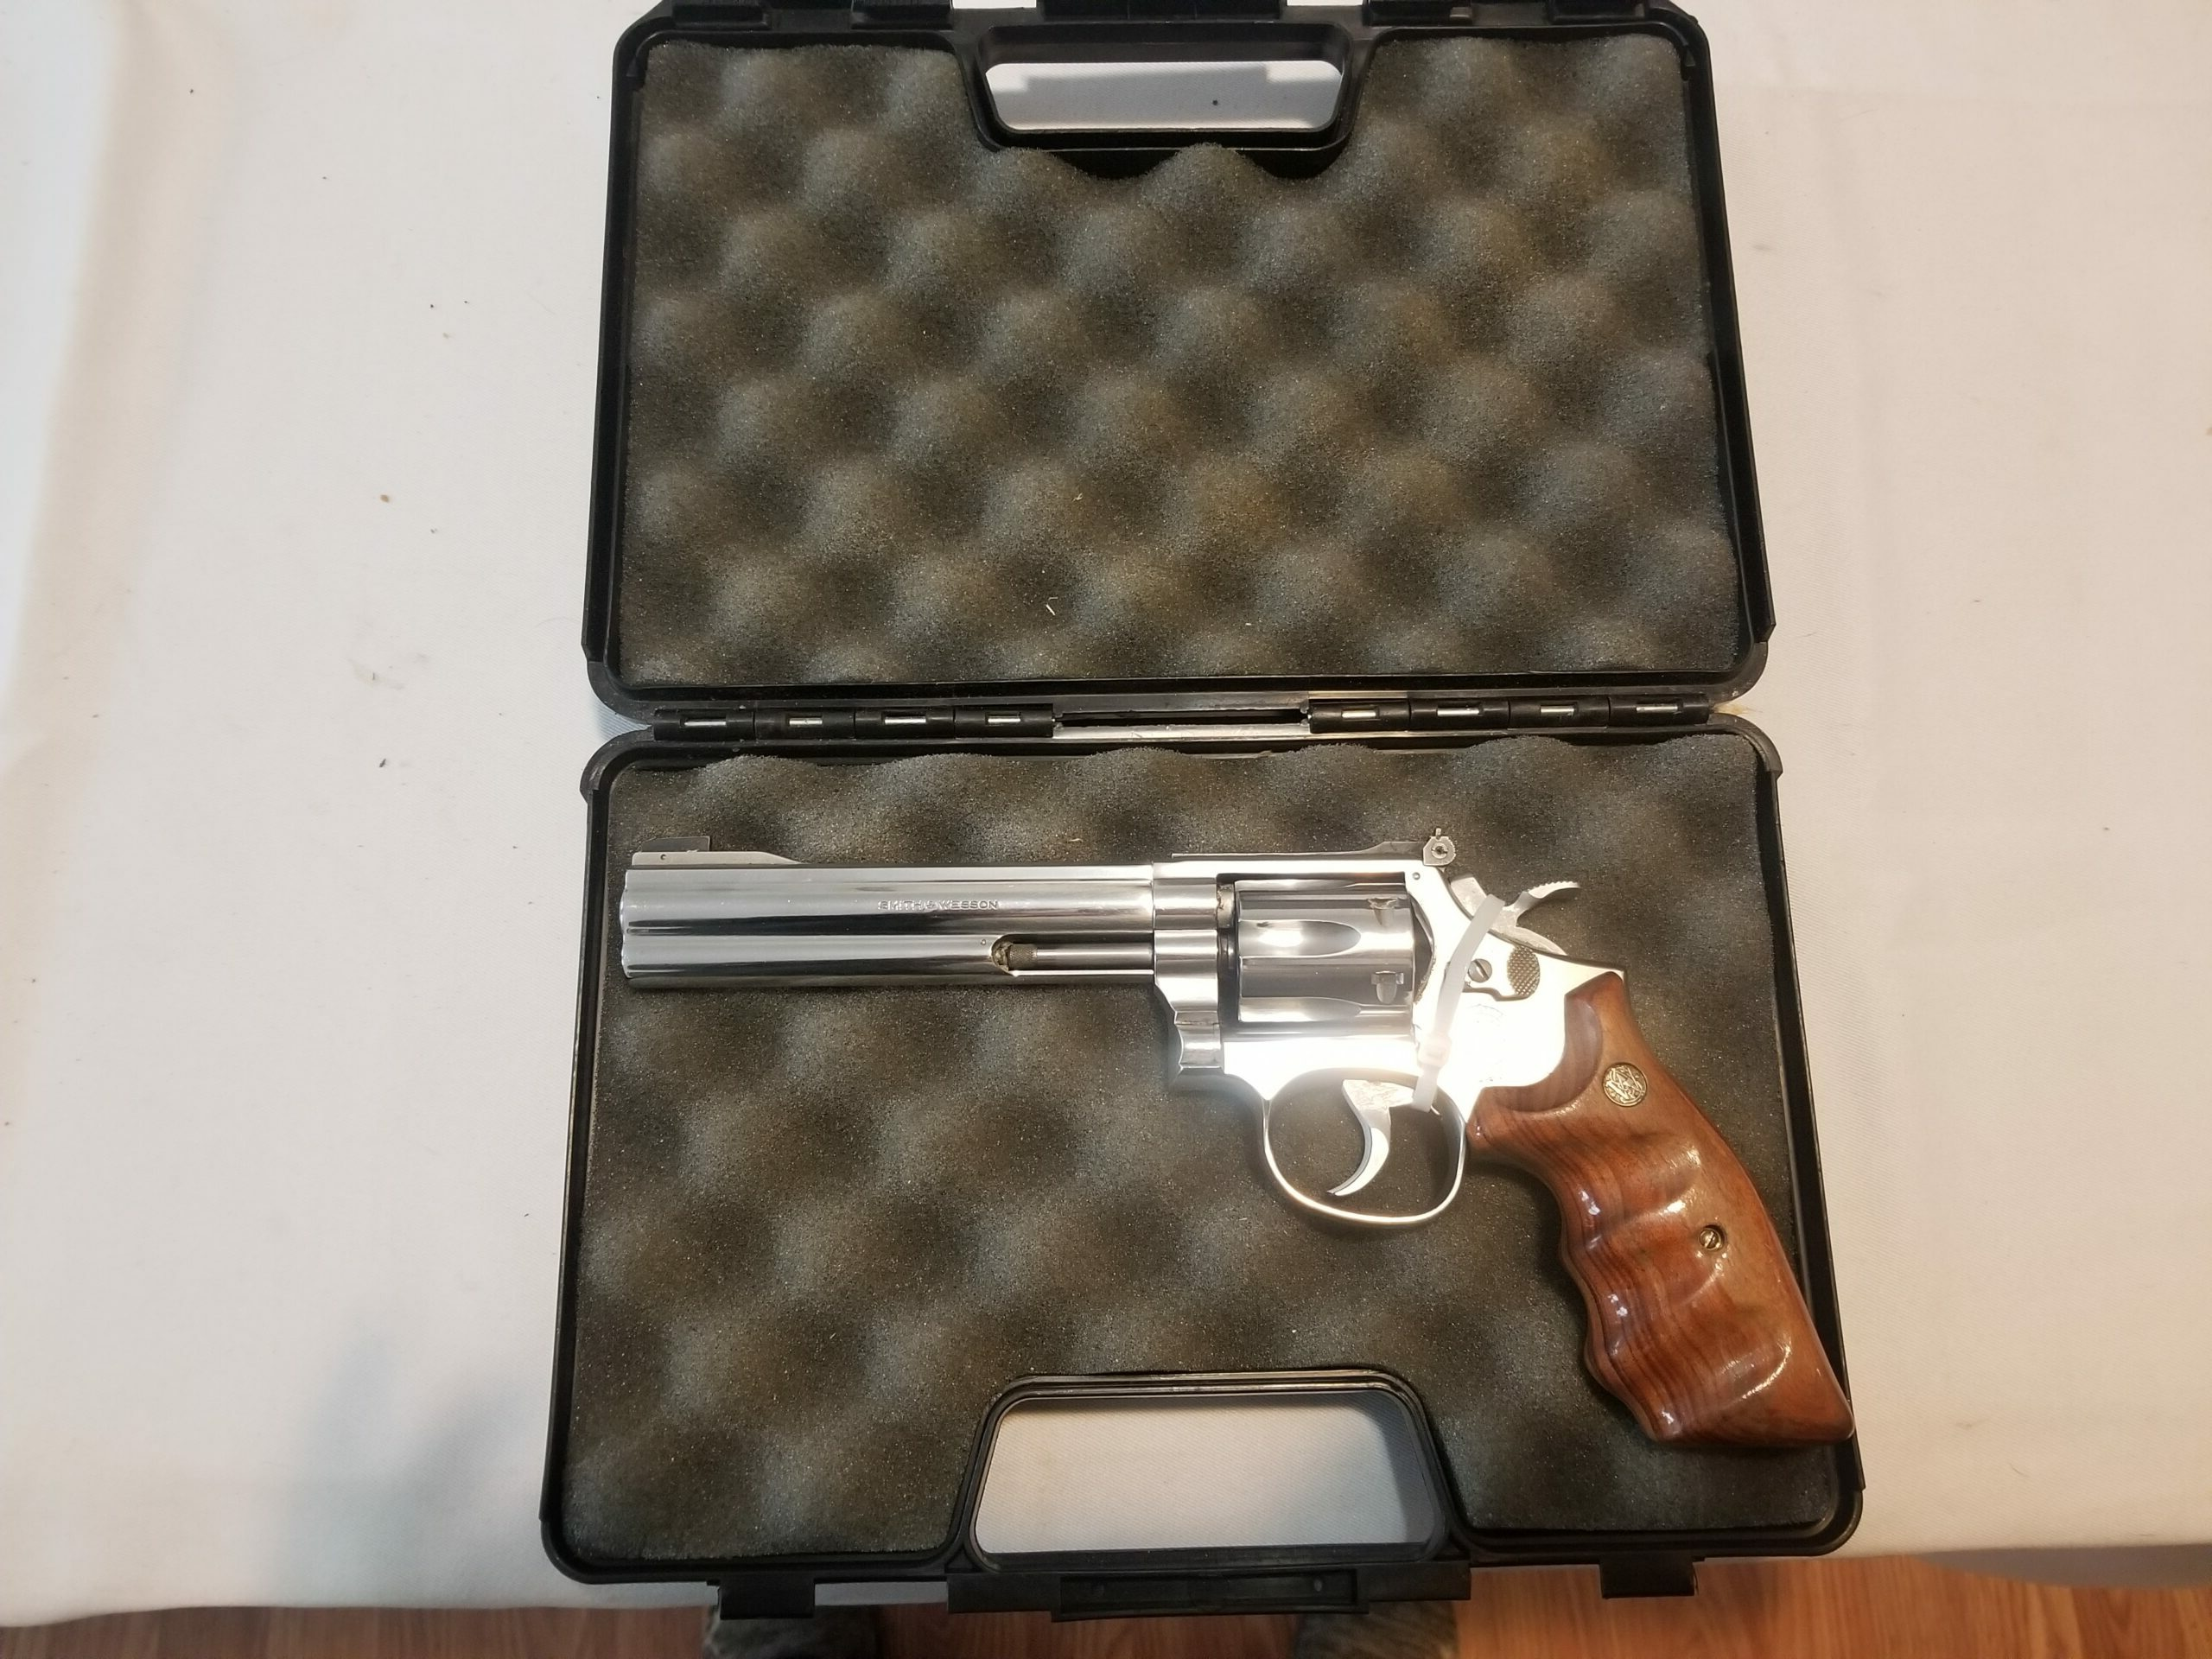 Smith & Wesson Model 617 .22 LR Revolver